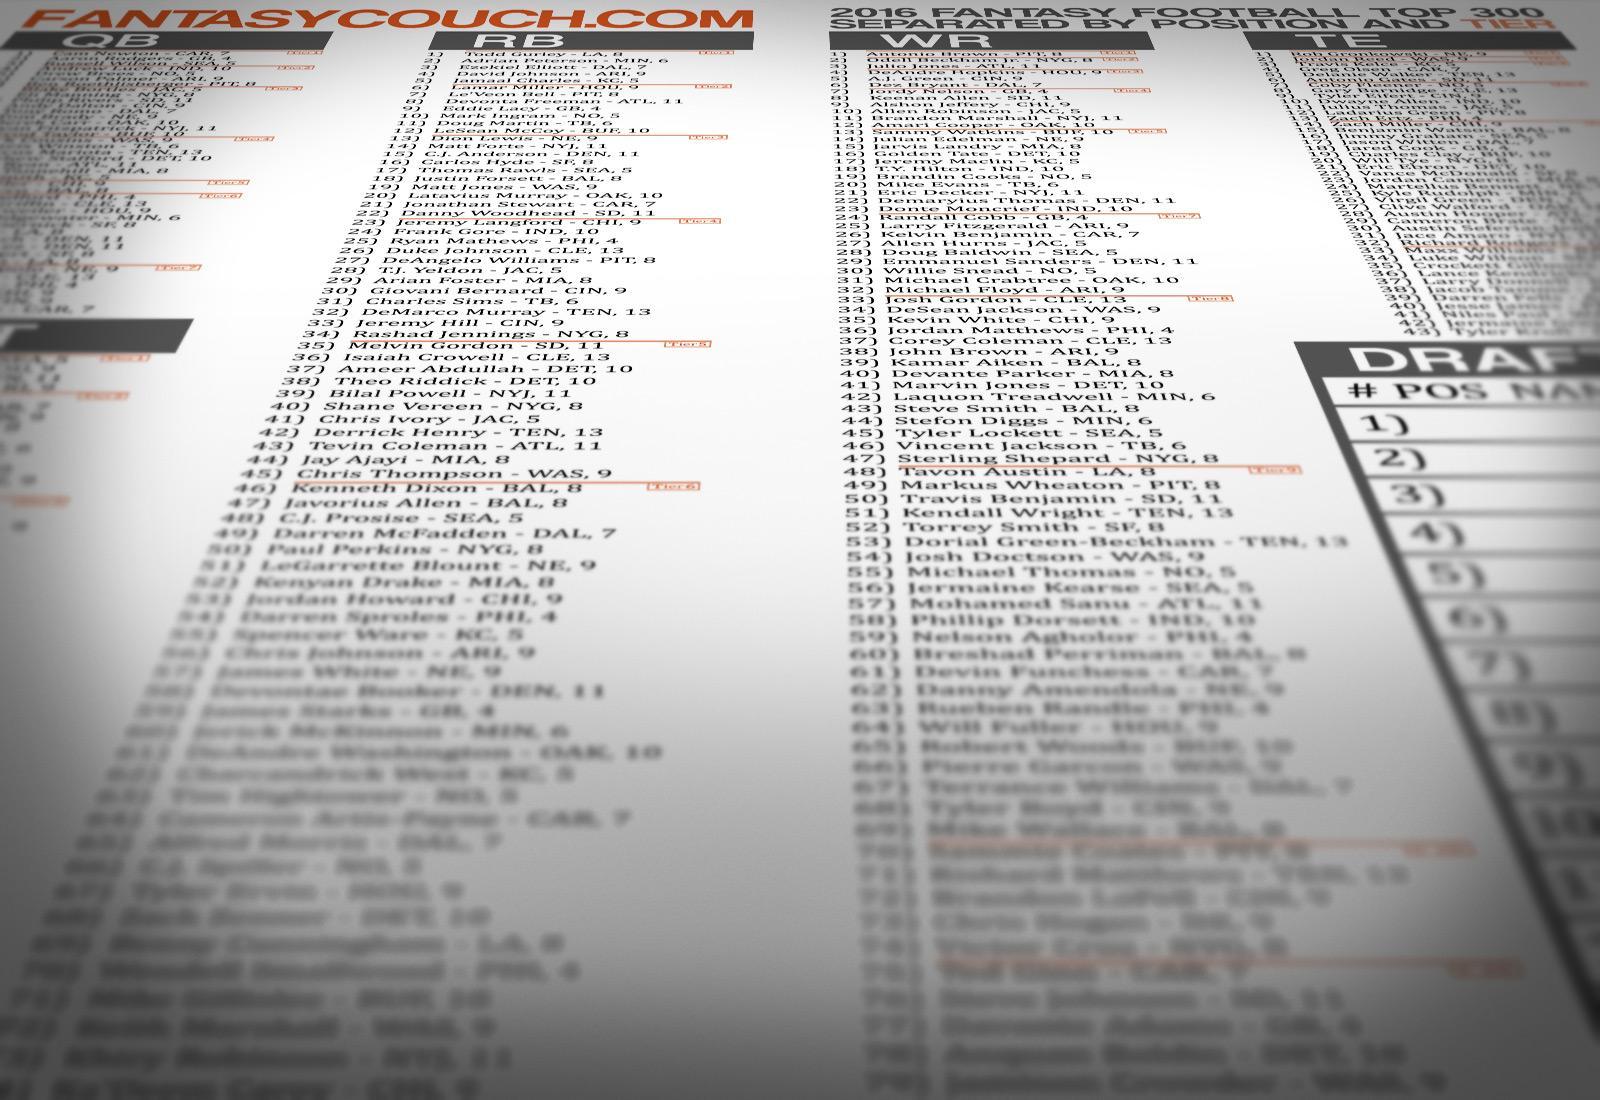 Top 300 List - Fantasy Football 2018 Cheat Sheet - Free Fantasy Football Draft Kit Printable